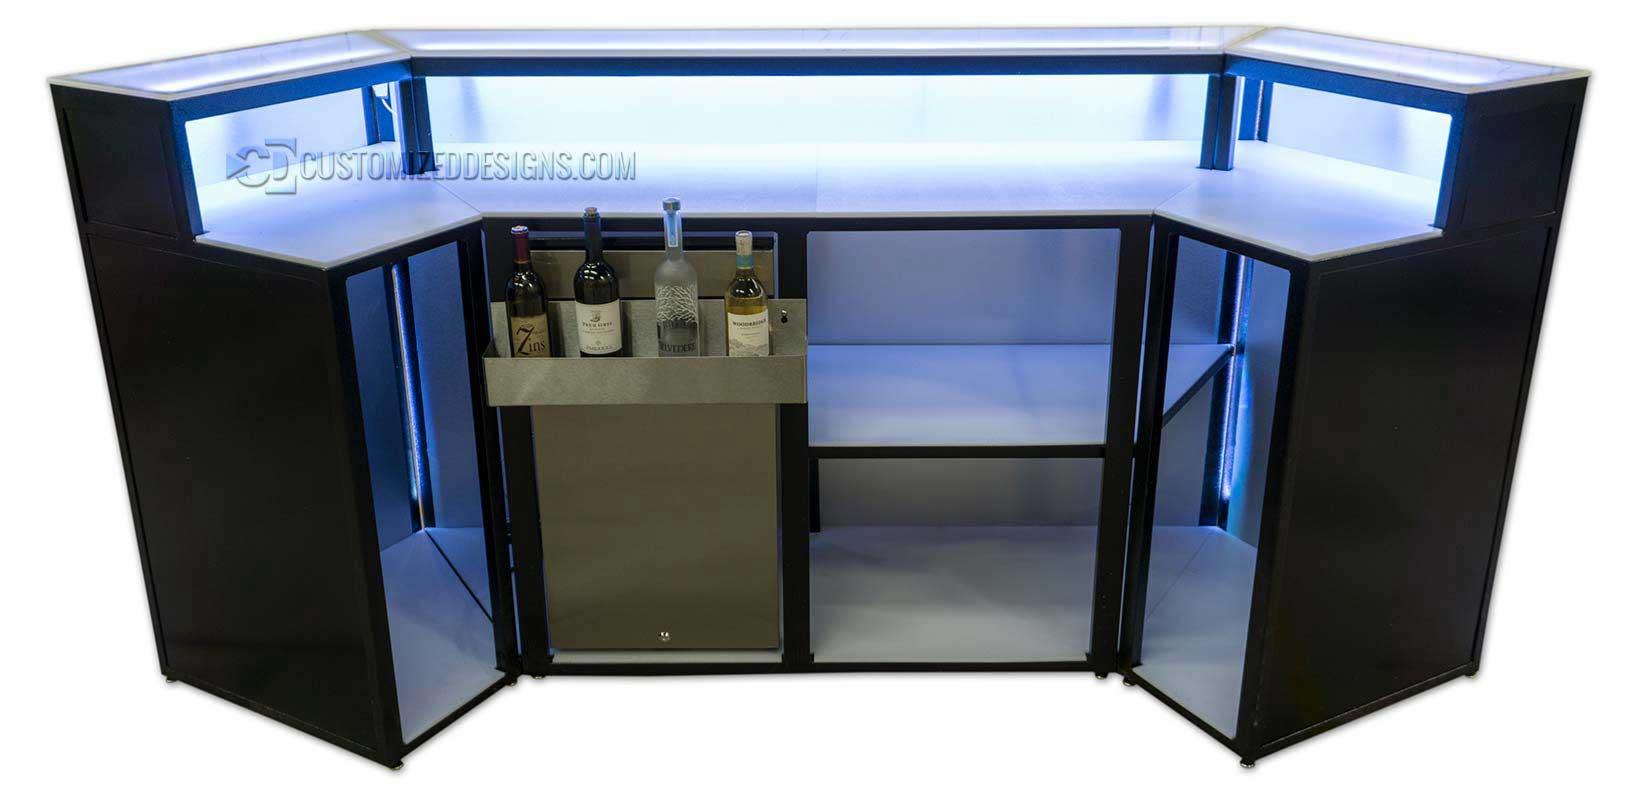 Modular Portable Bar   Custom Bars for Commercial Bars ... on Portable Backyard Bar id=50399